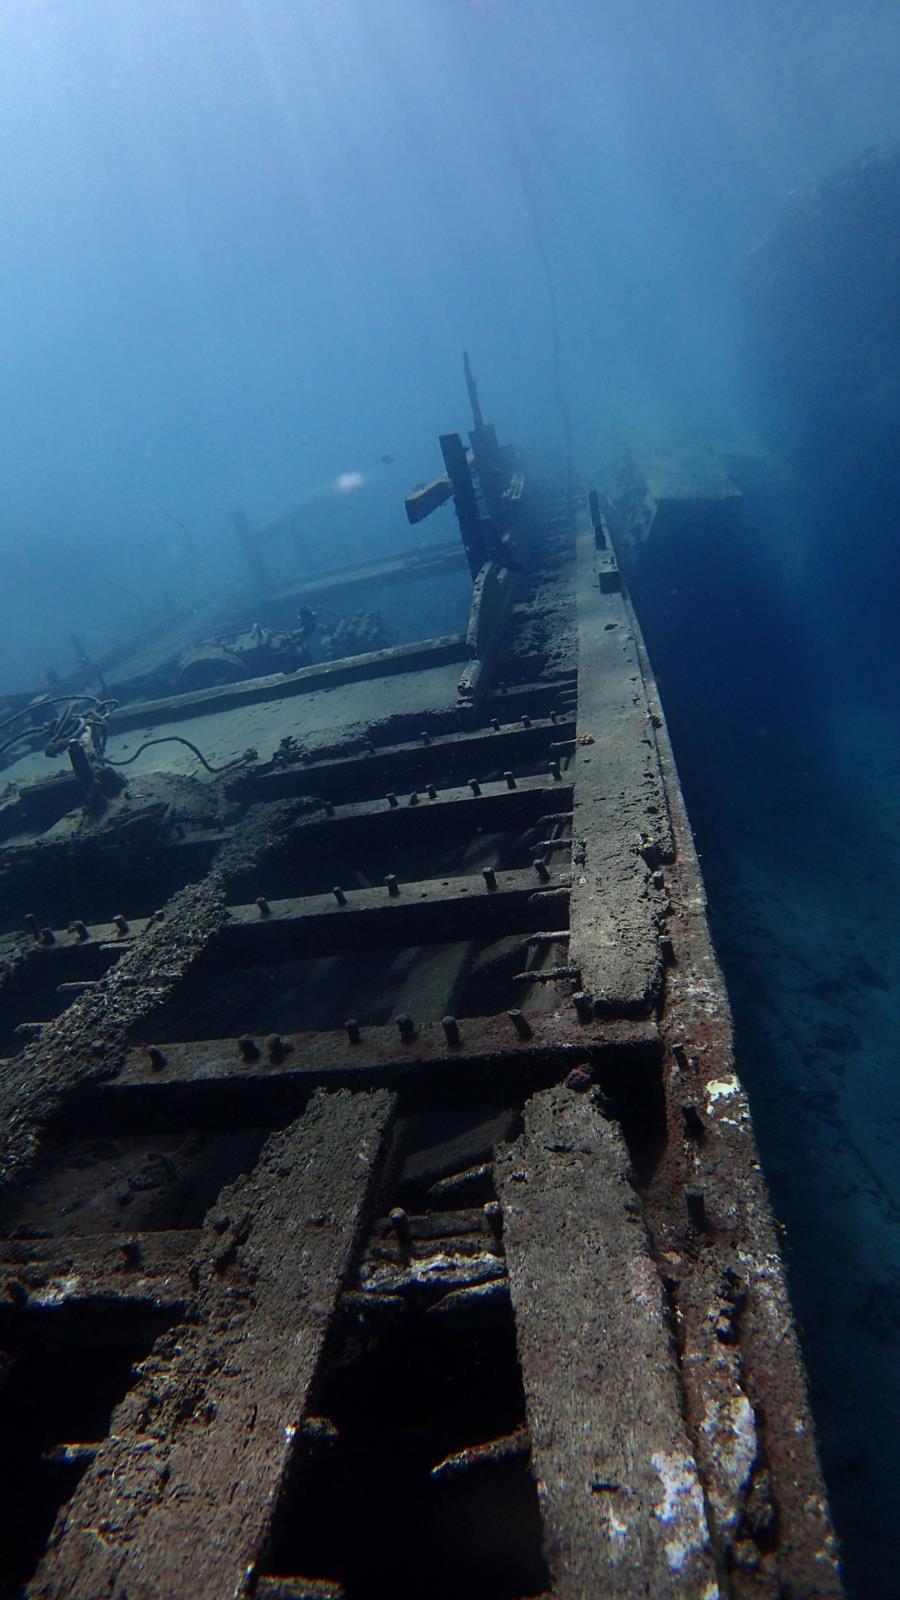 Japanese Cargo Wreck (GDS Leato) - Wreck @gorontalo